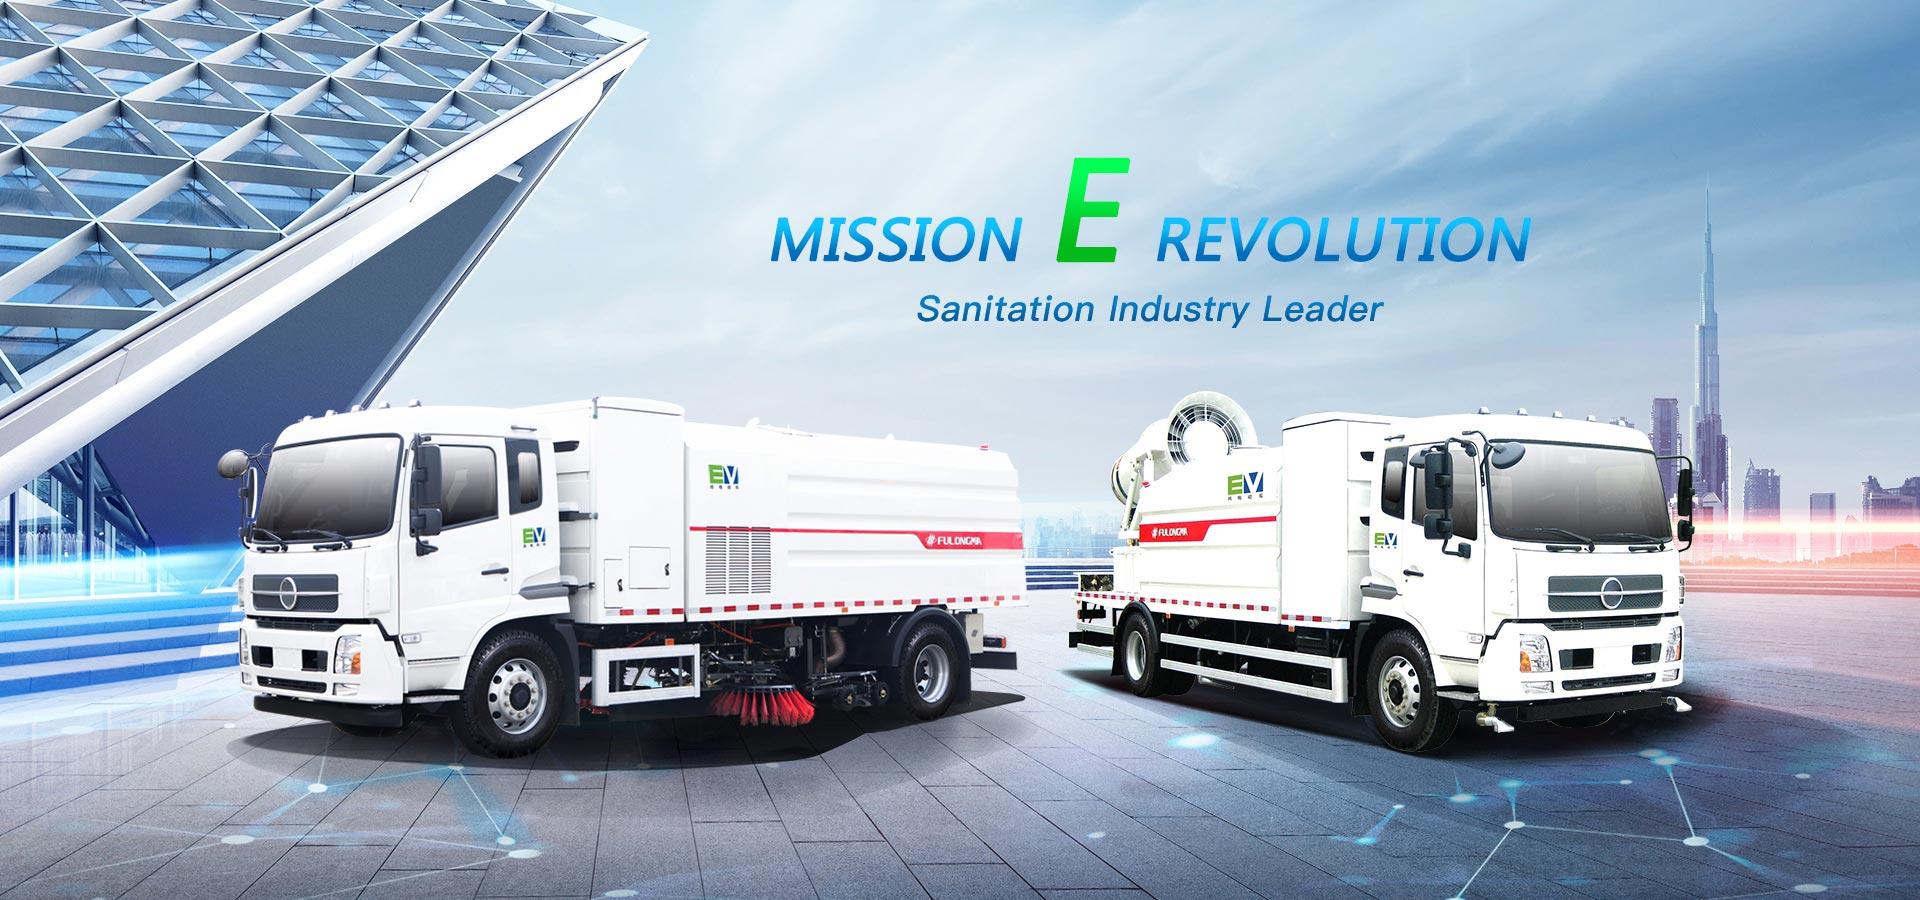 Mission E Revolution